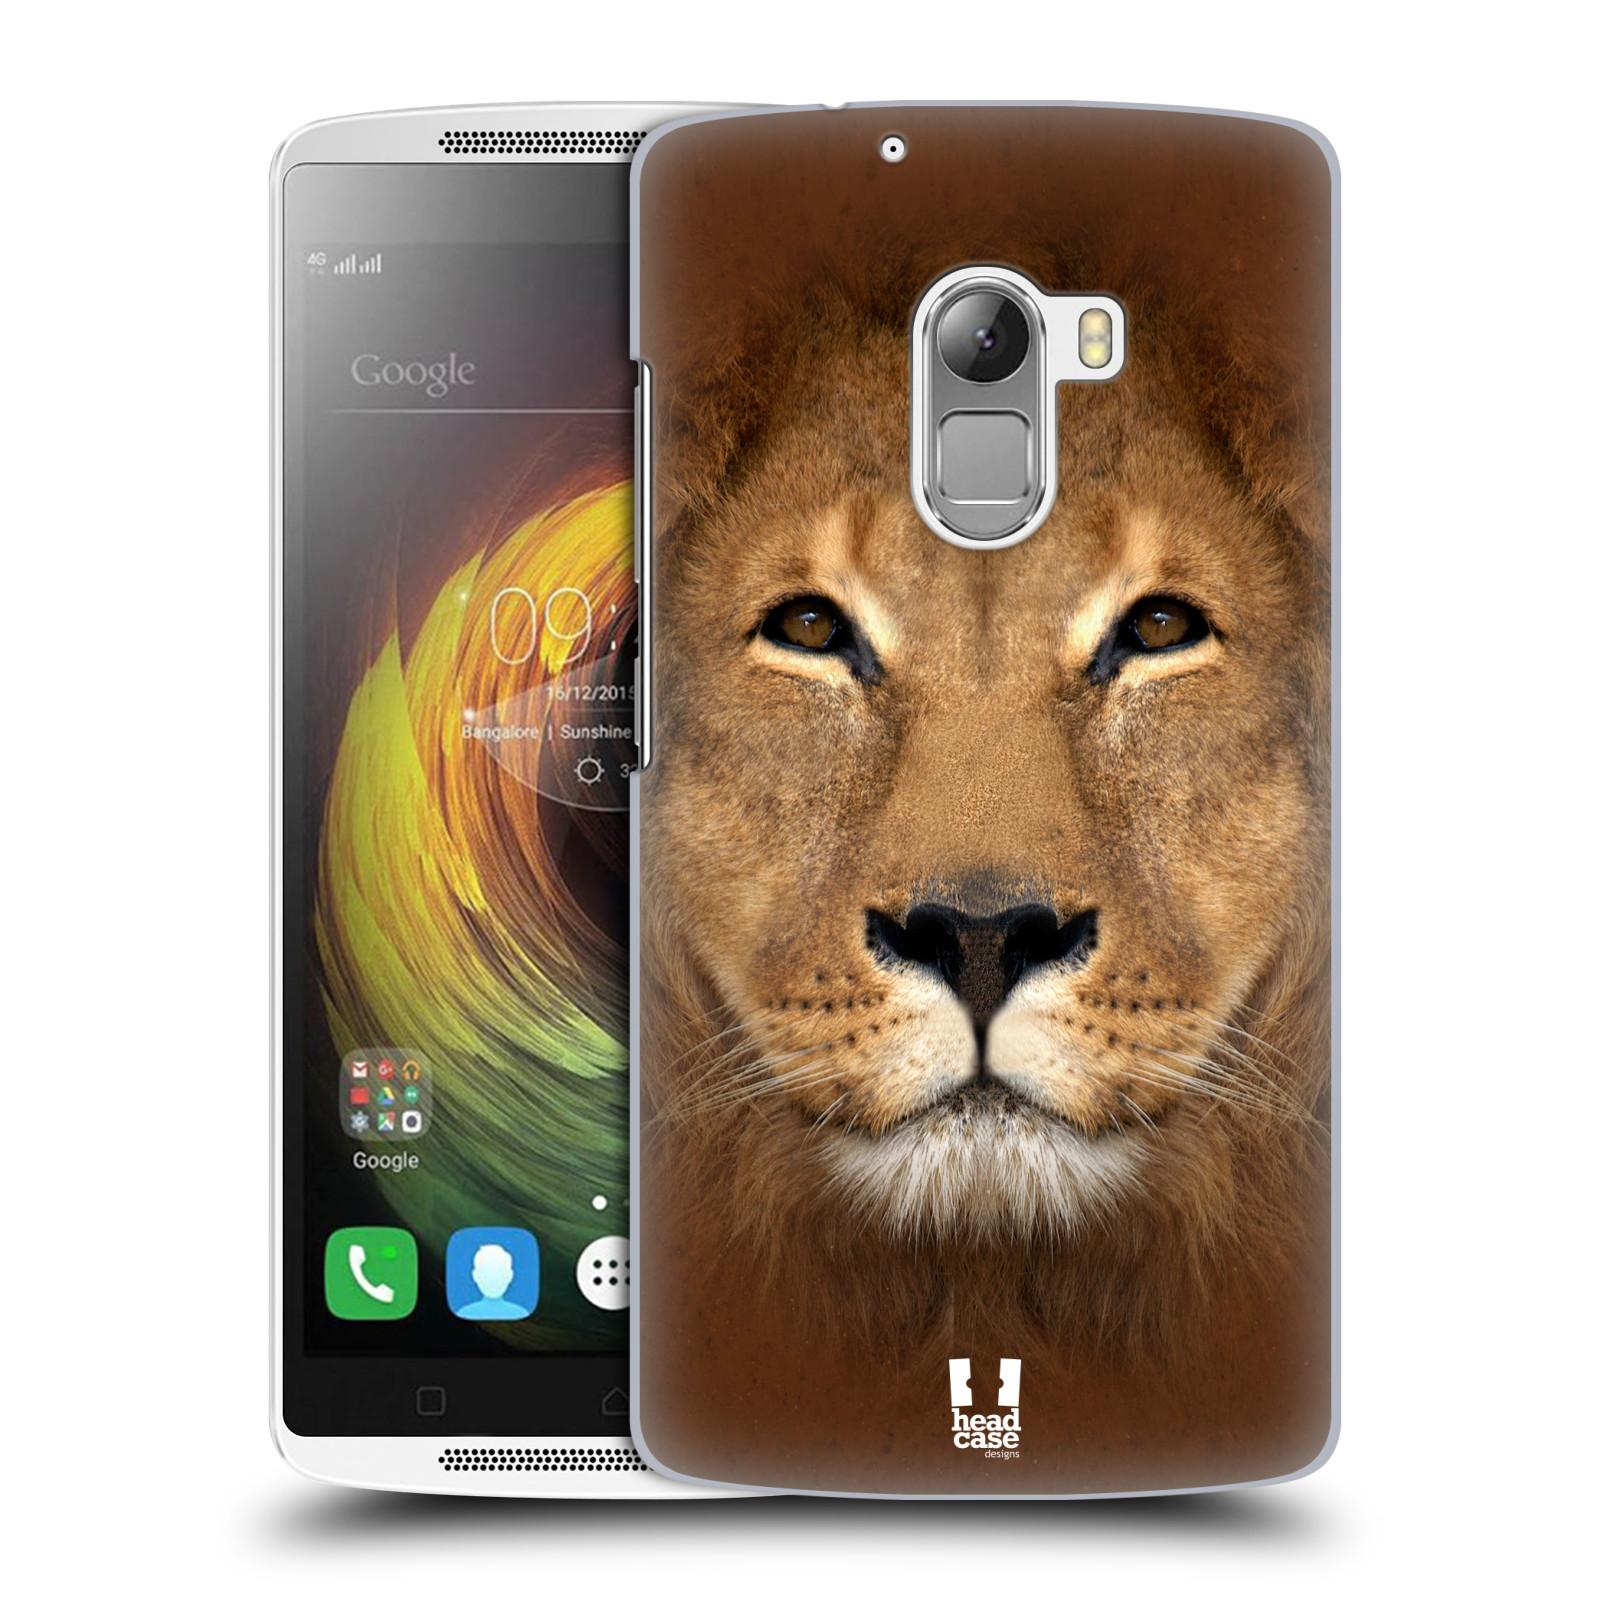 HEAD CASE pevný plastový obal na mobil LENOVO A7010 / A7010 DUAL / K4 Note / Vibe X3 lite vzor Zvířecí tváře 2 Lev